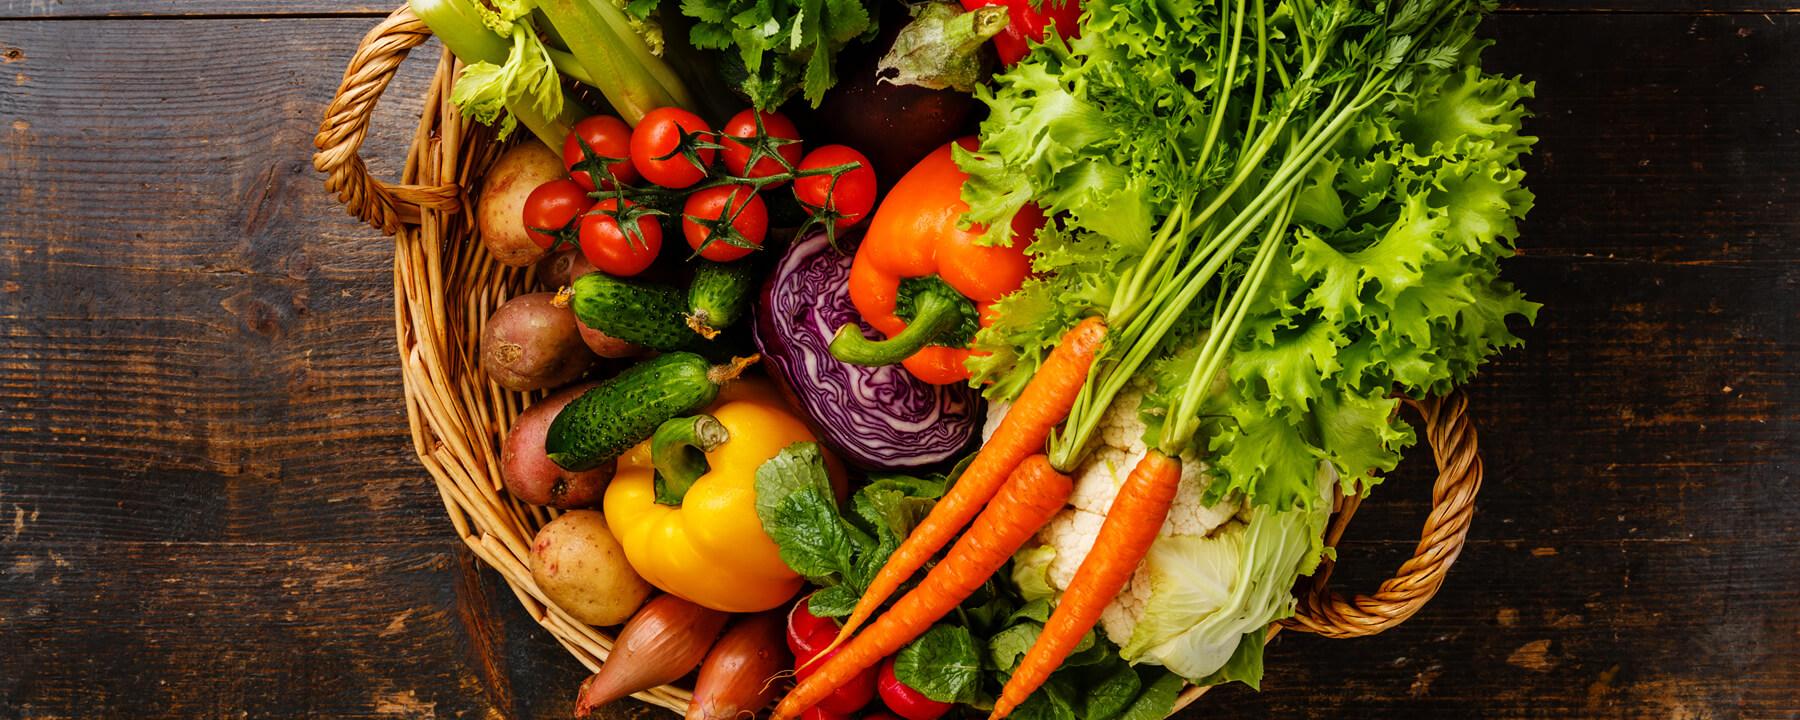 Harvest essentials from Grass Root Grower LLC.